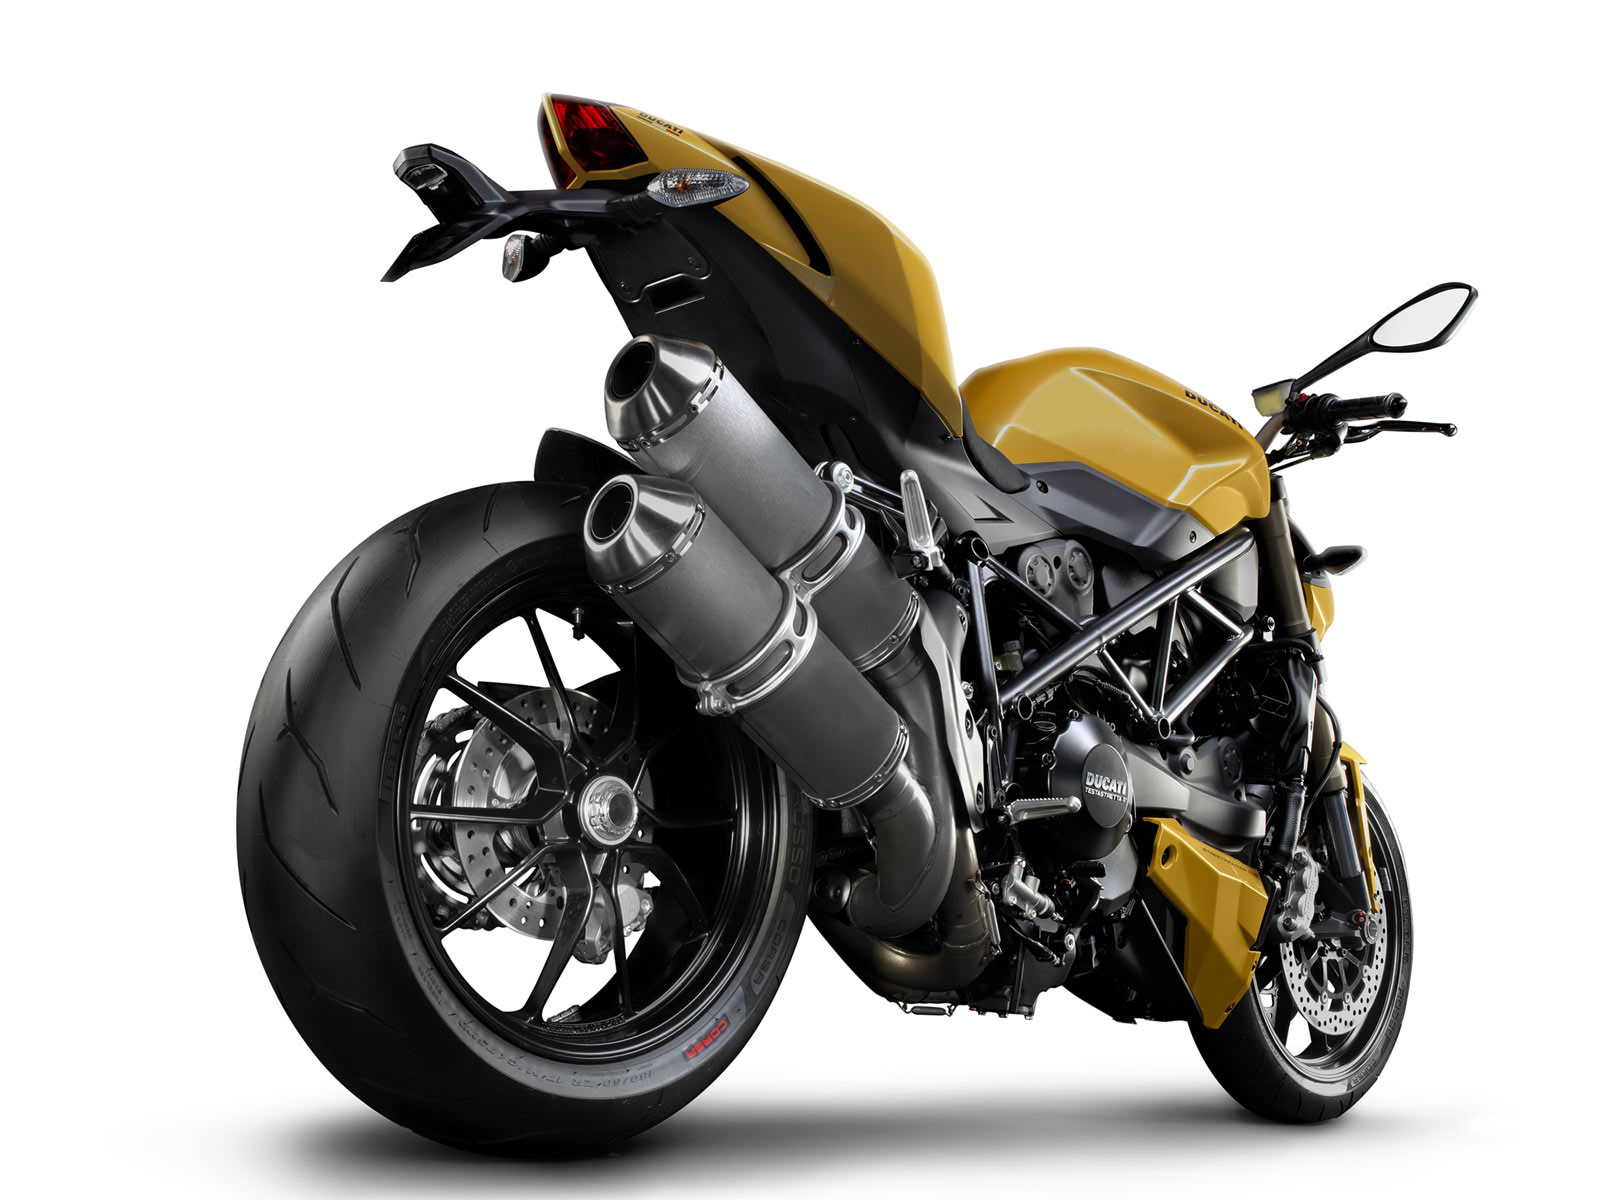 2012 ducati streetfighter 848 motorcycle wallpaper